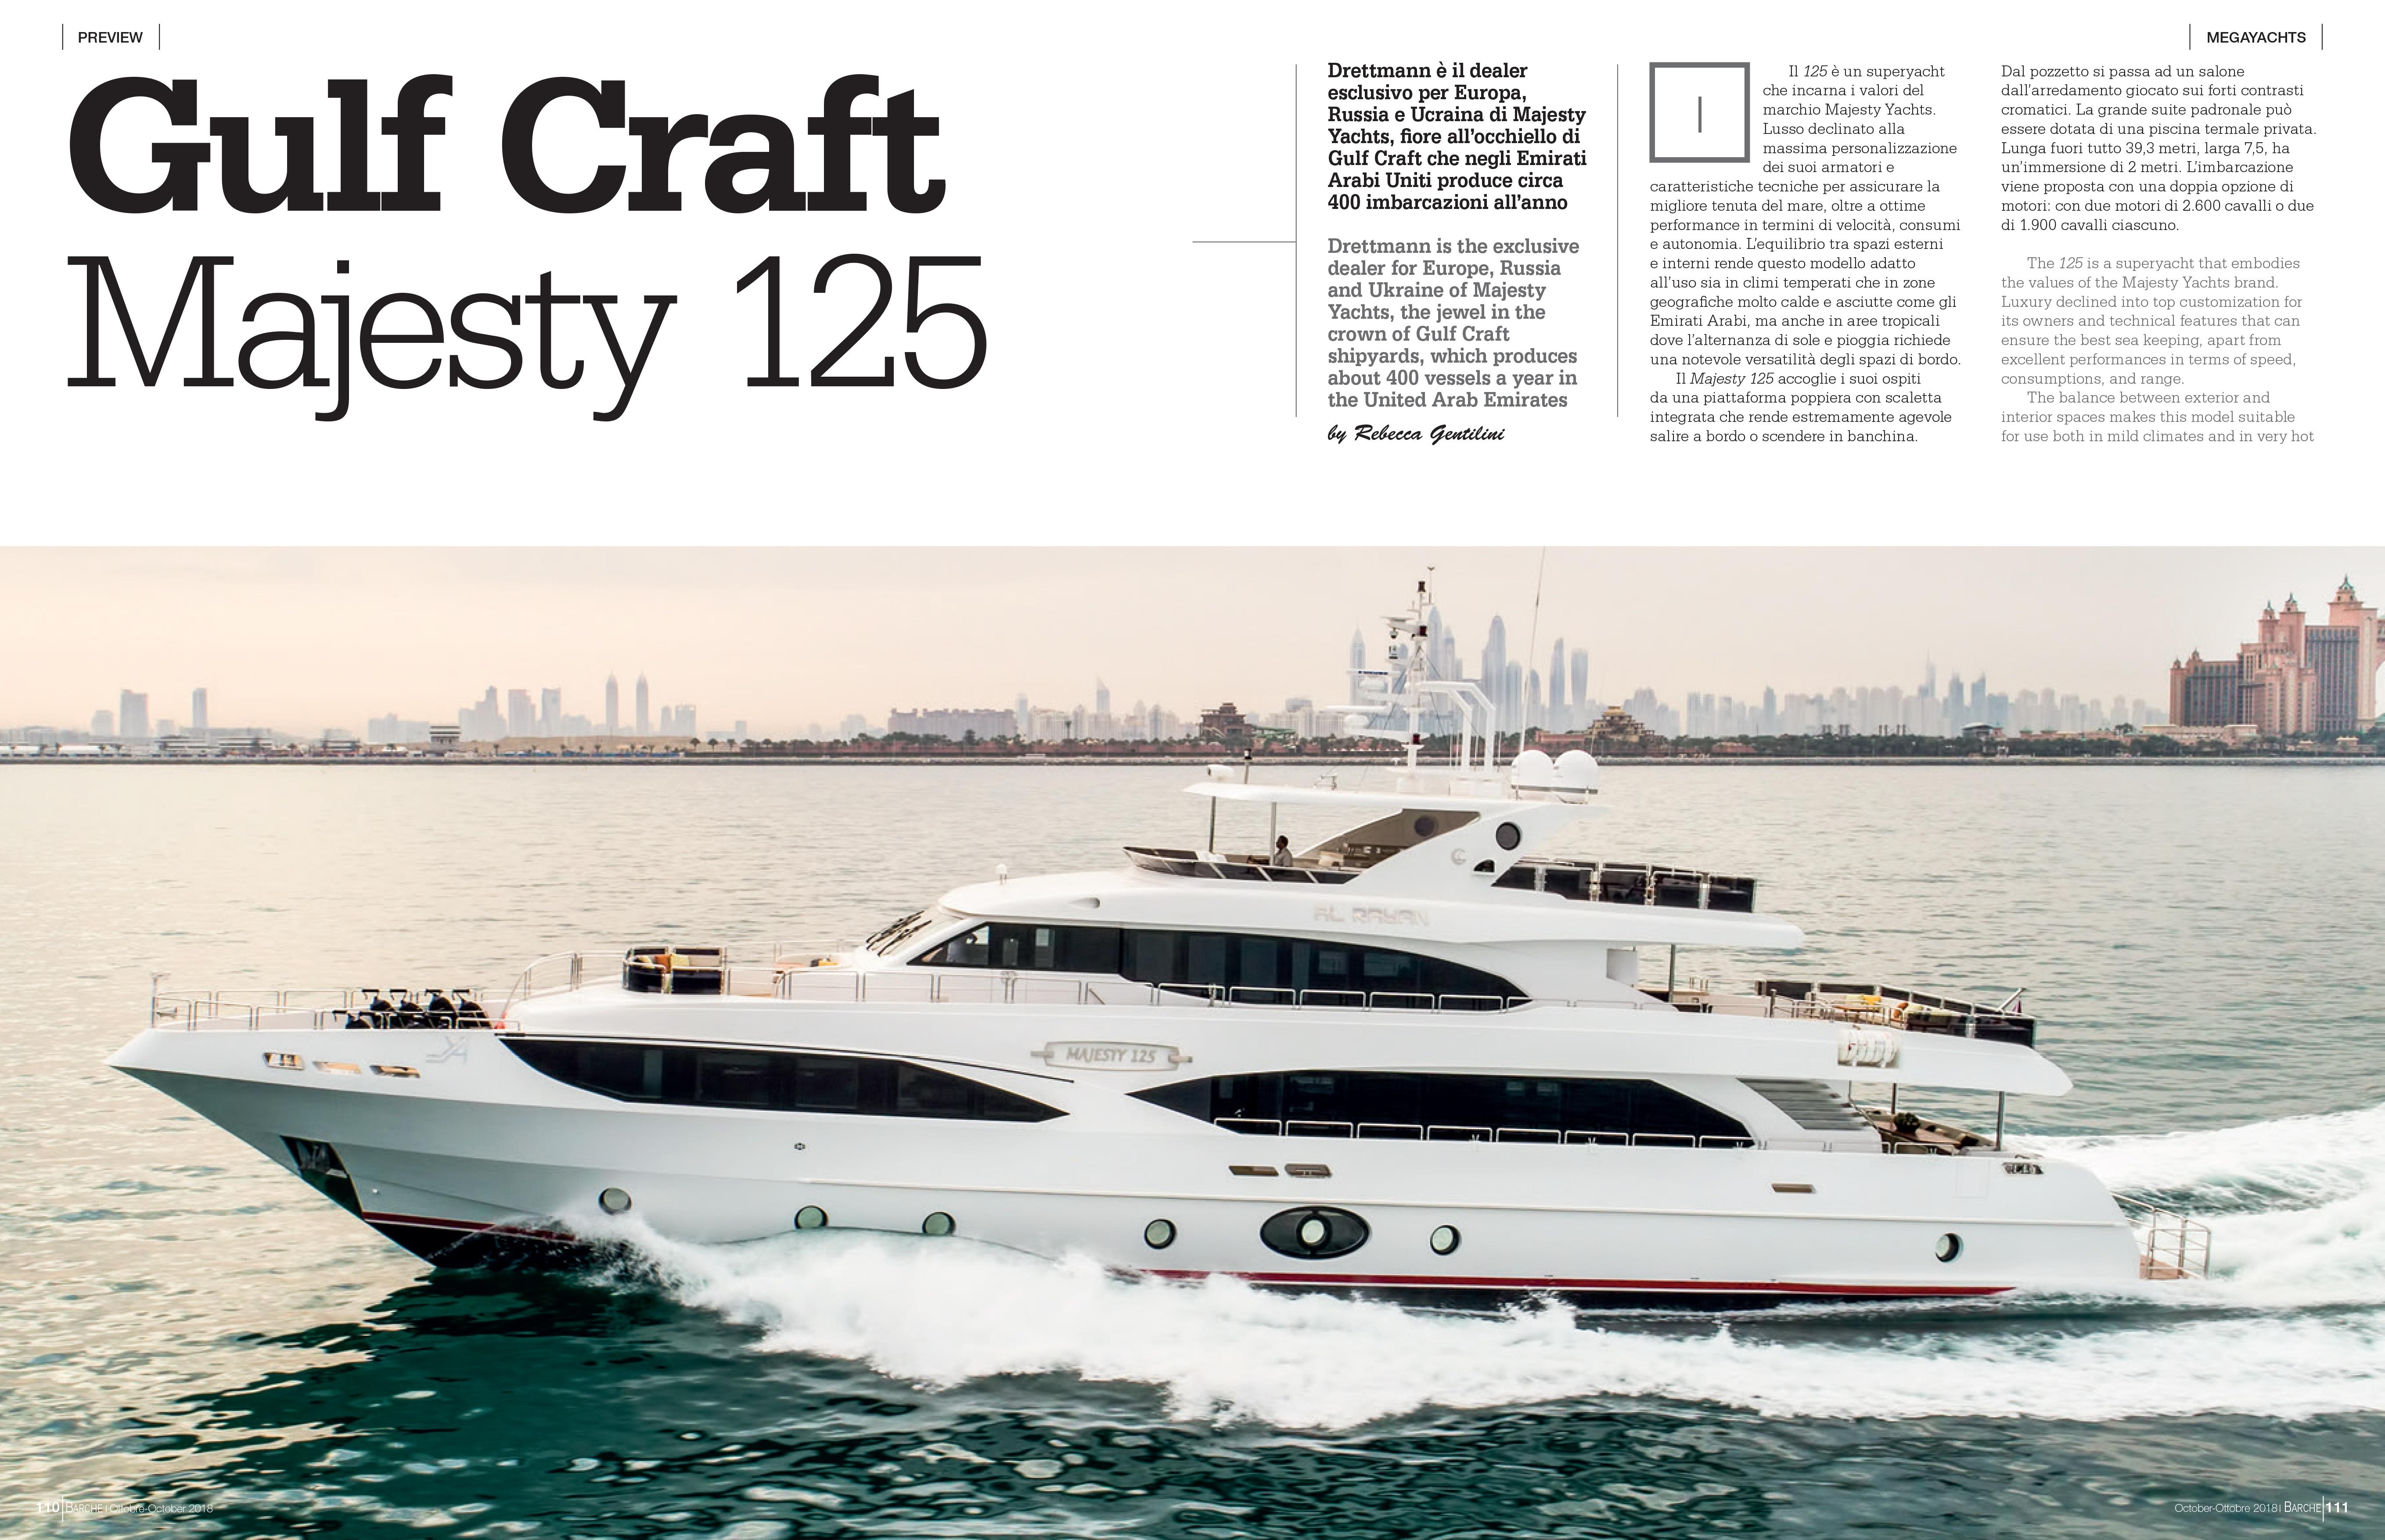 BARCHE---October-2018-issue,-Majesty-125,-Gulf-Craft-2